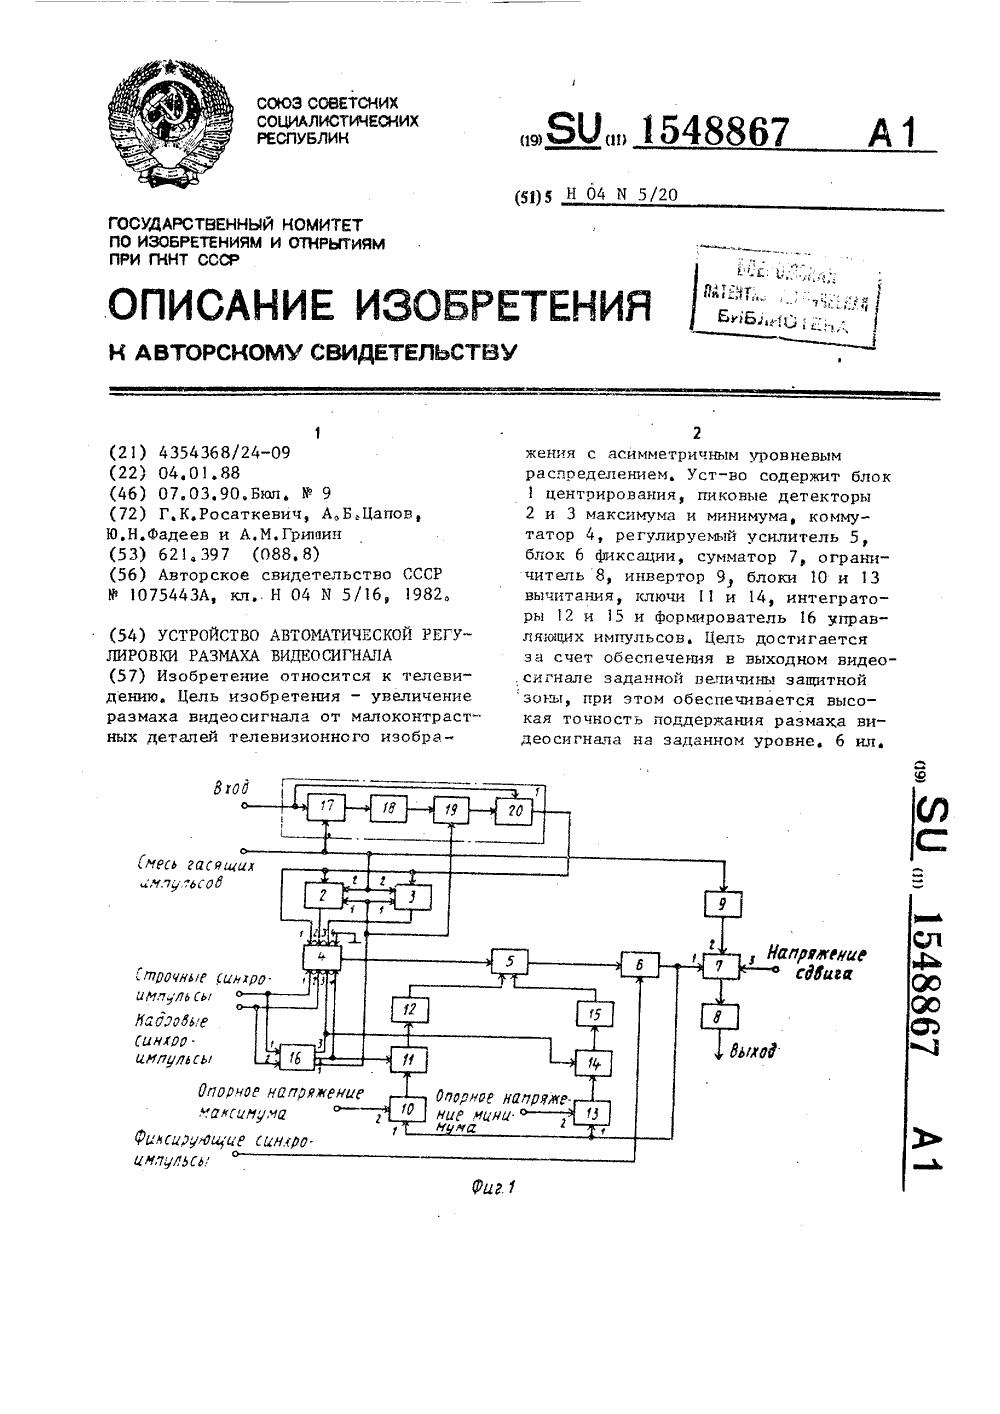 схема детектора видеосигнала